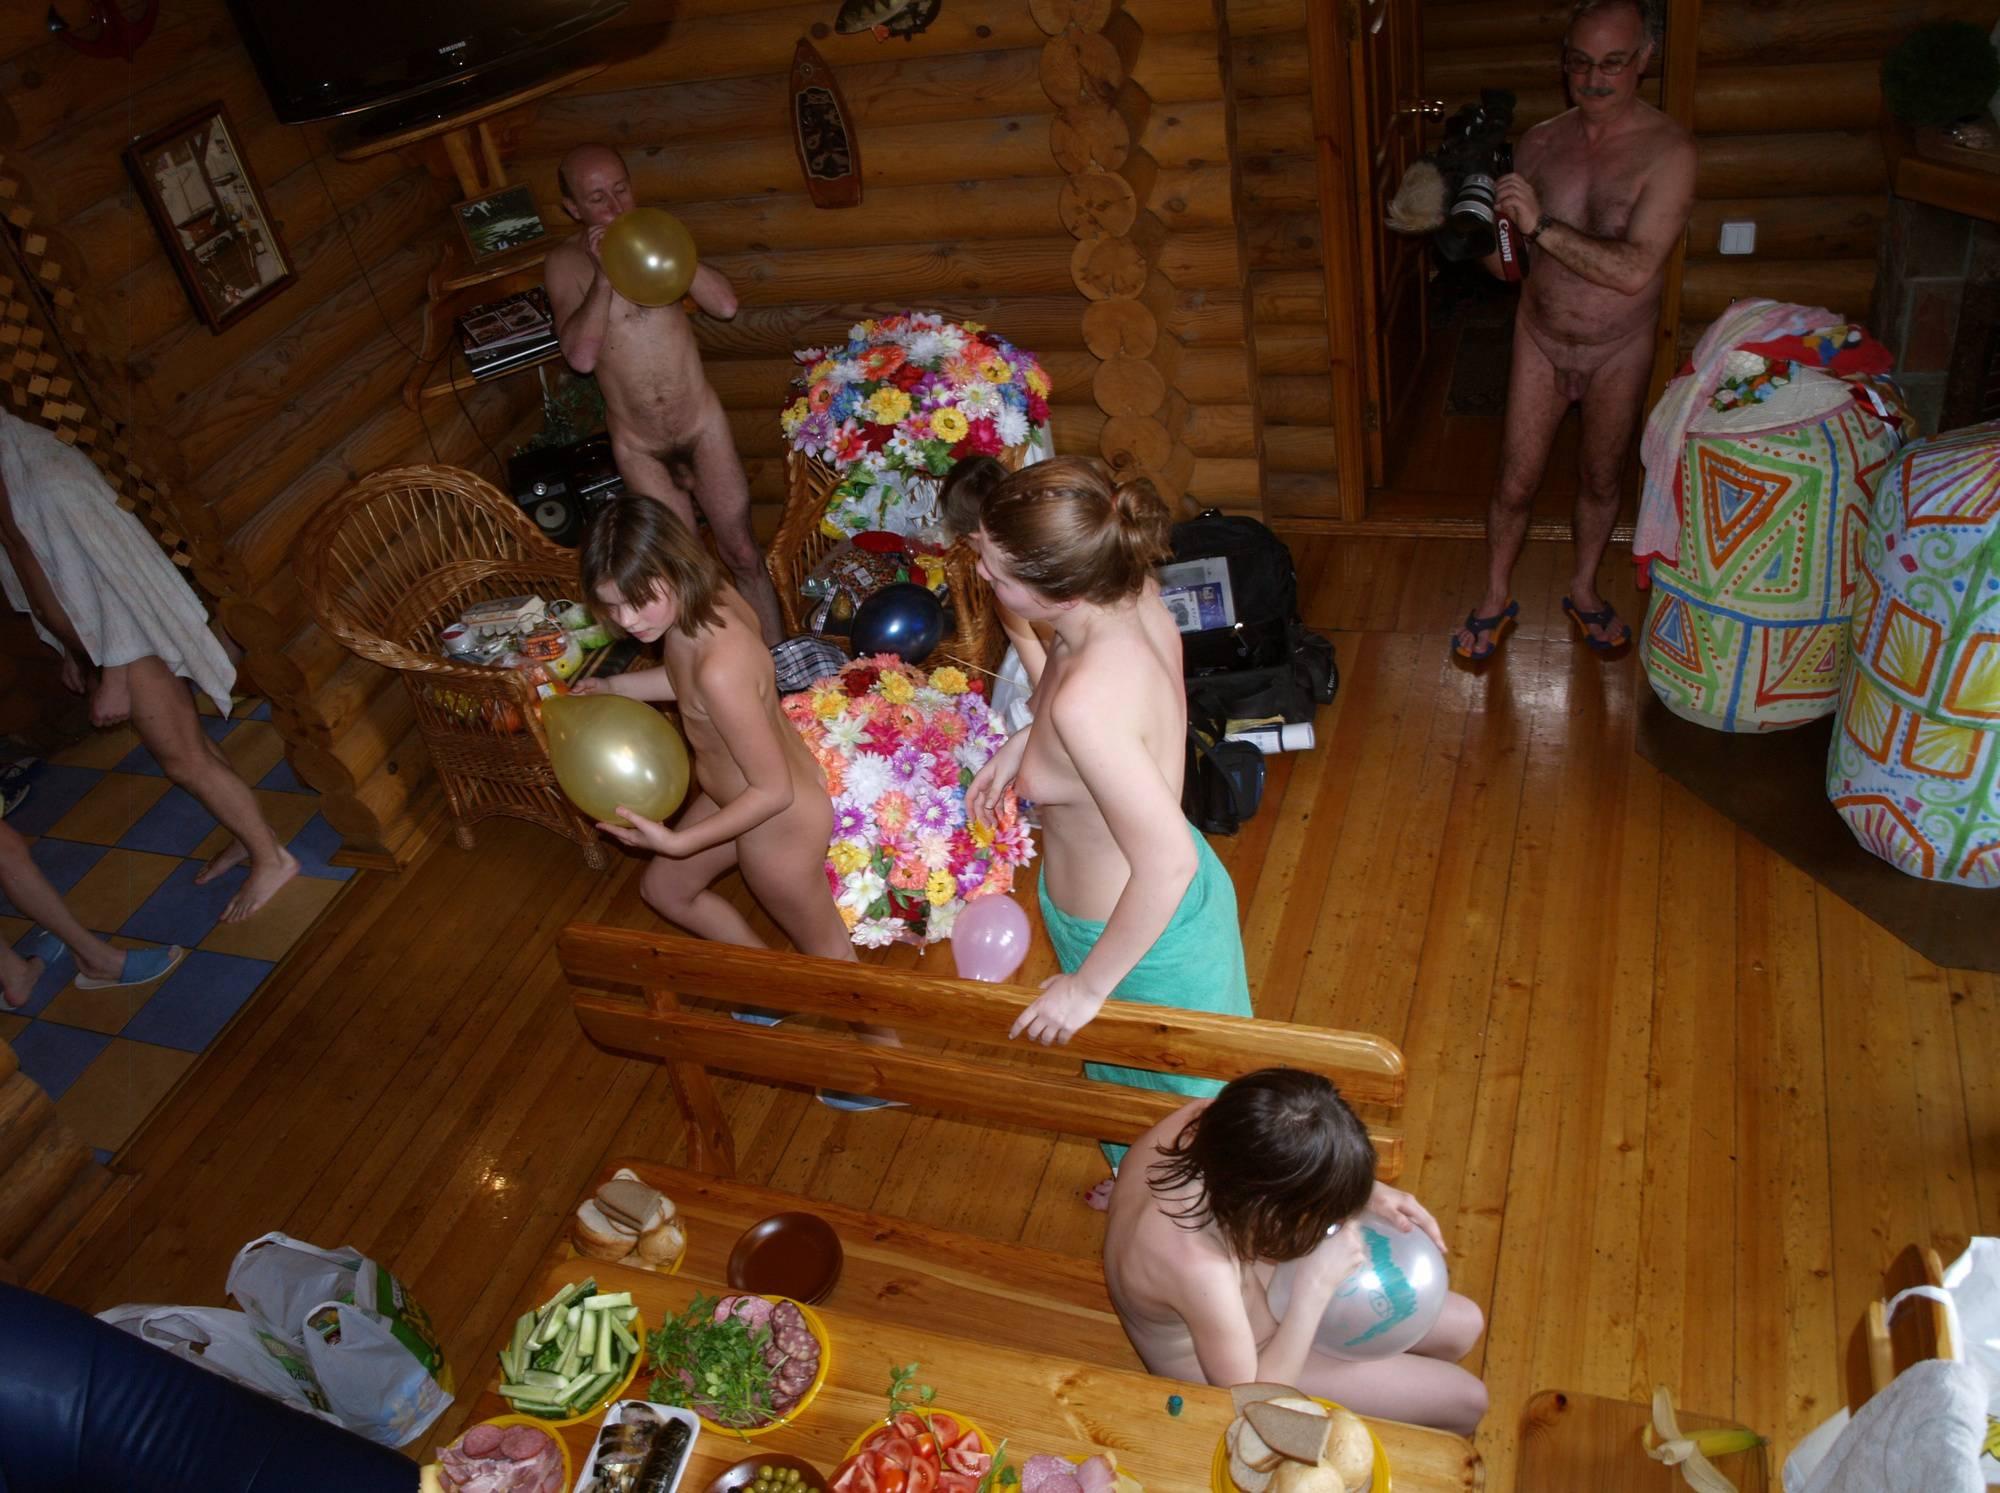 Purenudism Photos Nude Easter Basket Game - 3